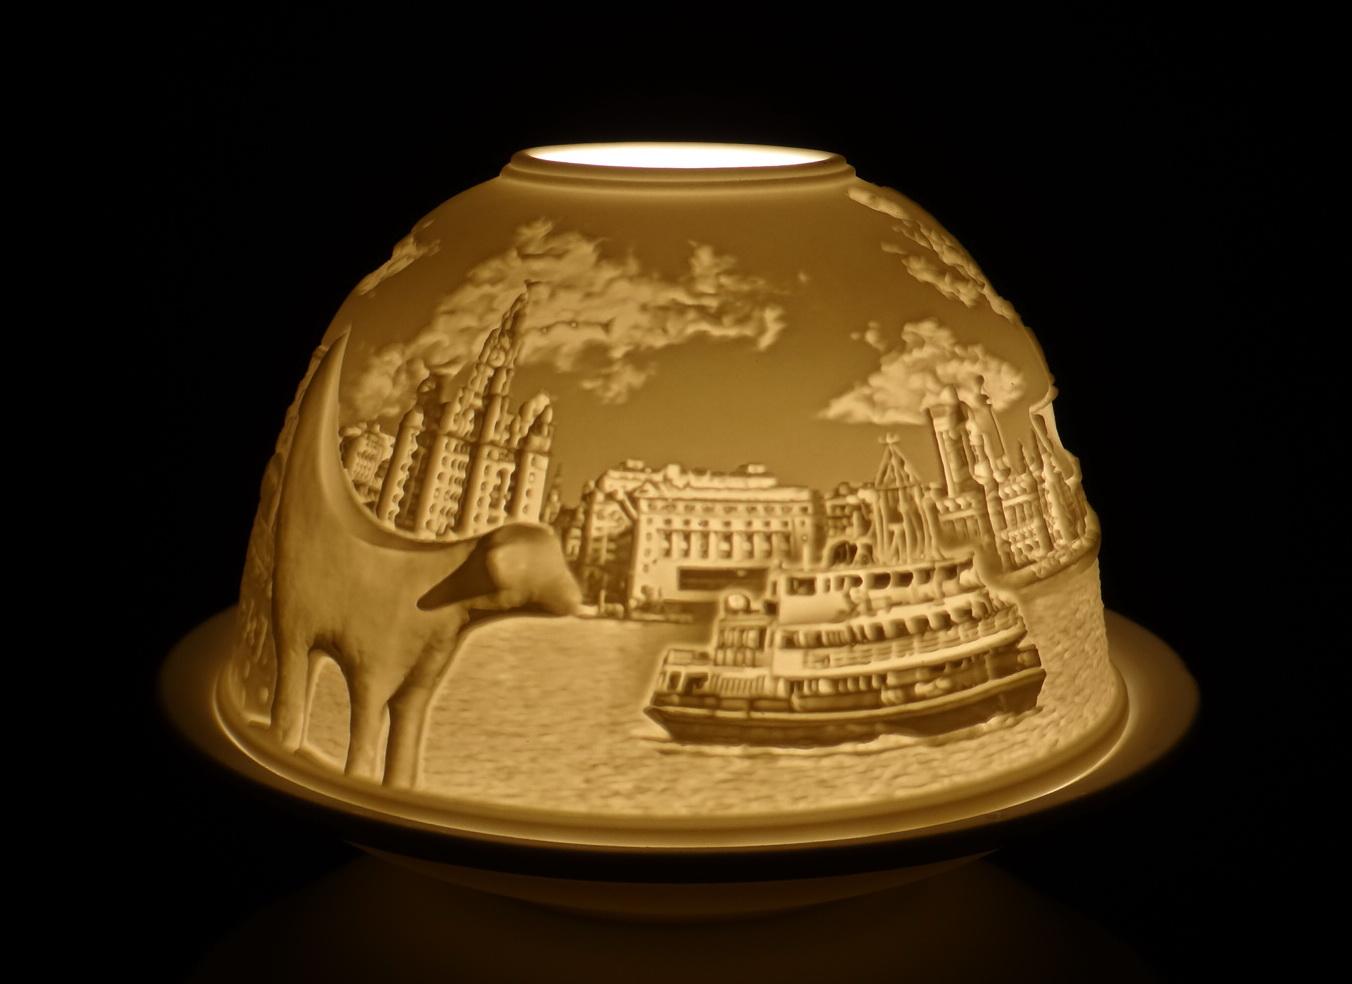 Liverpool 2 Skyline Ceramic Tea Light Holder